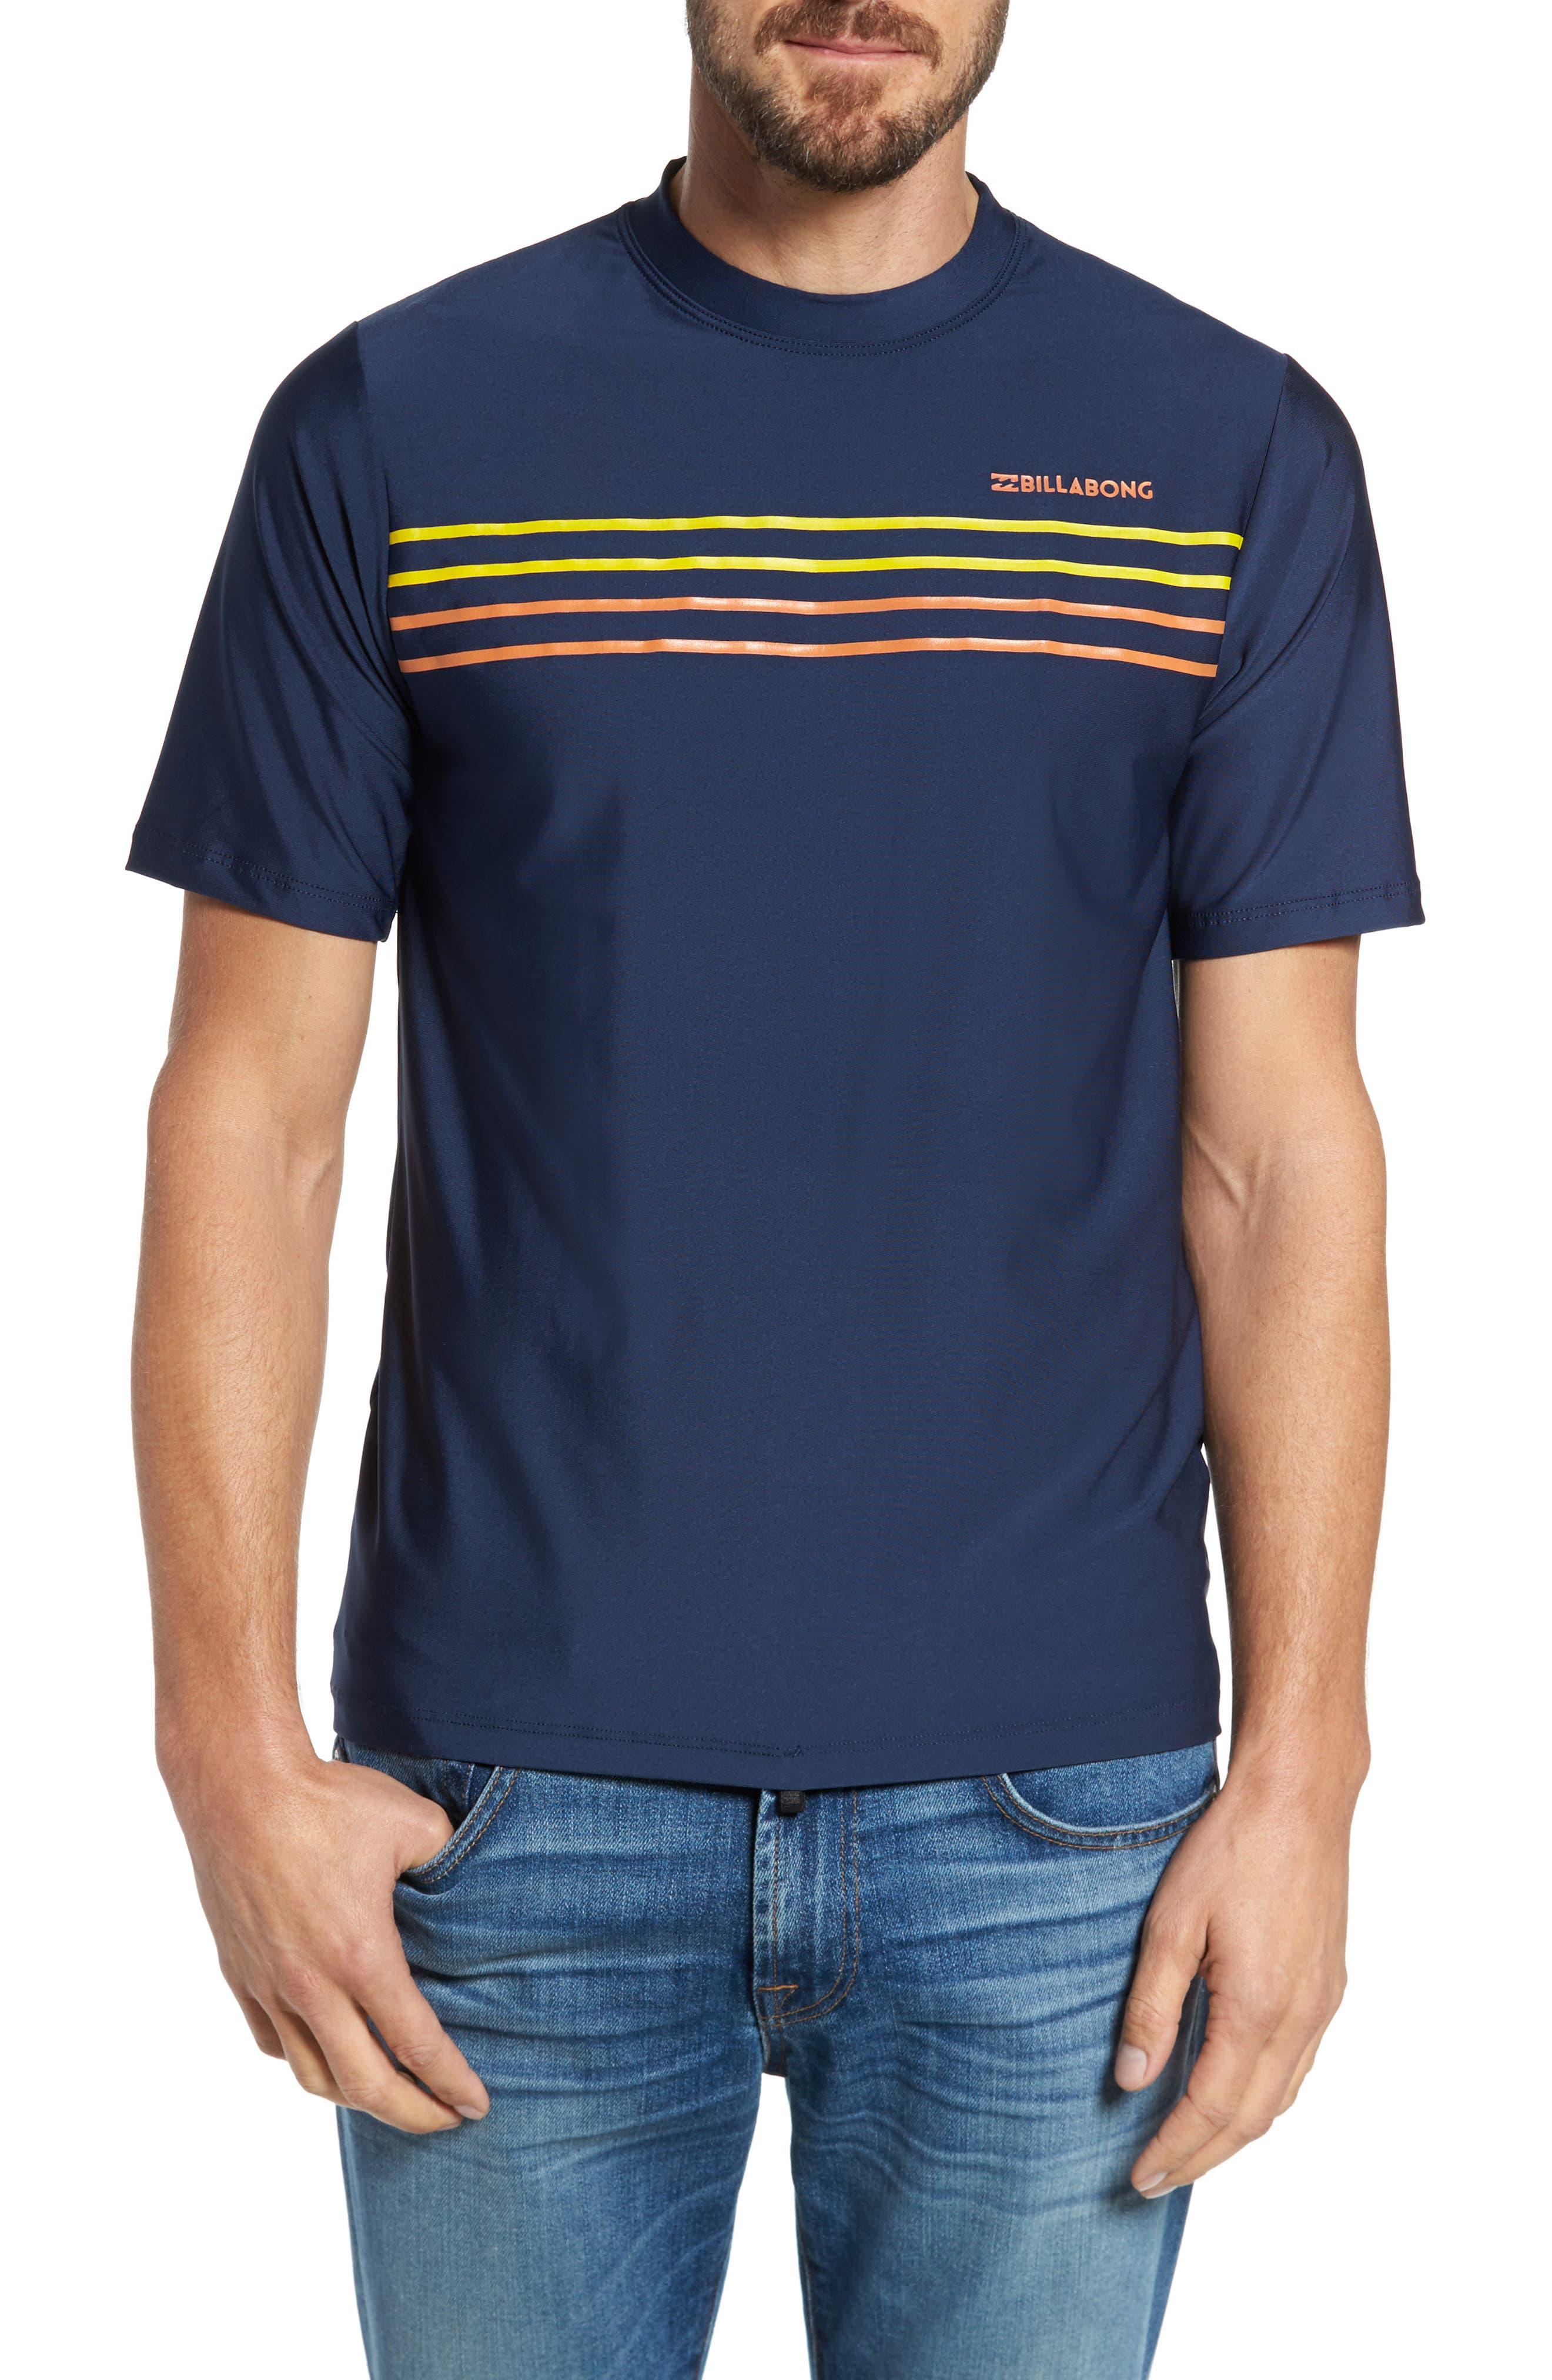 Billabong Lo Tide Spinner Rashguard T-Shirt